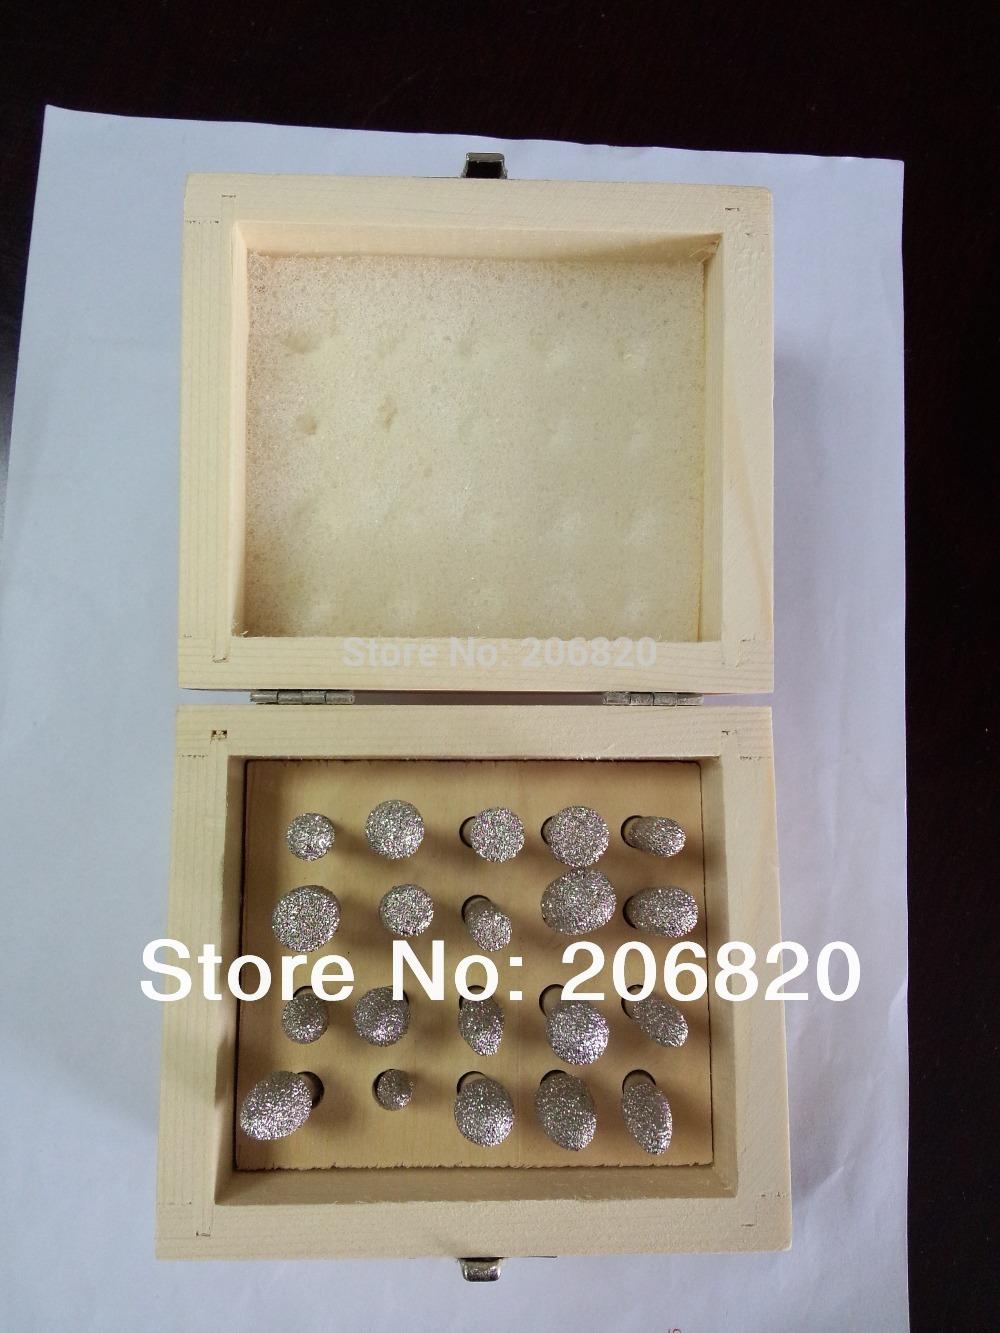 2014 Rushed Hilti Saw Dremel Accessories free Shipping Vacuum Brazed Diamond Burr Set Stone Marble Engraving Bit for Cnc Machine(China (Mainland))